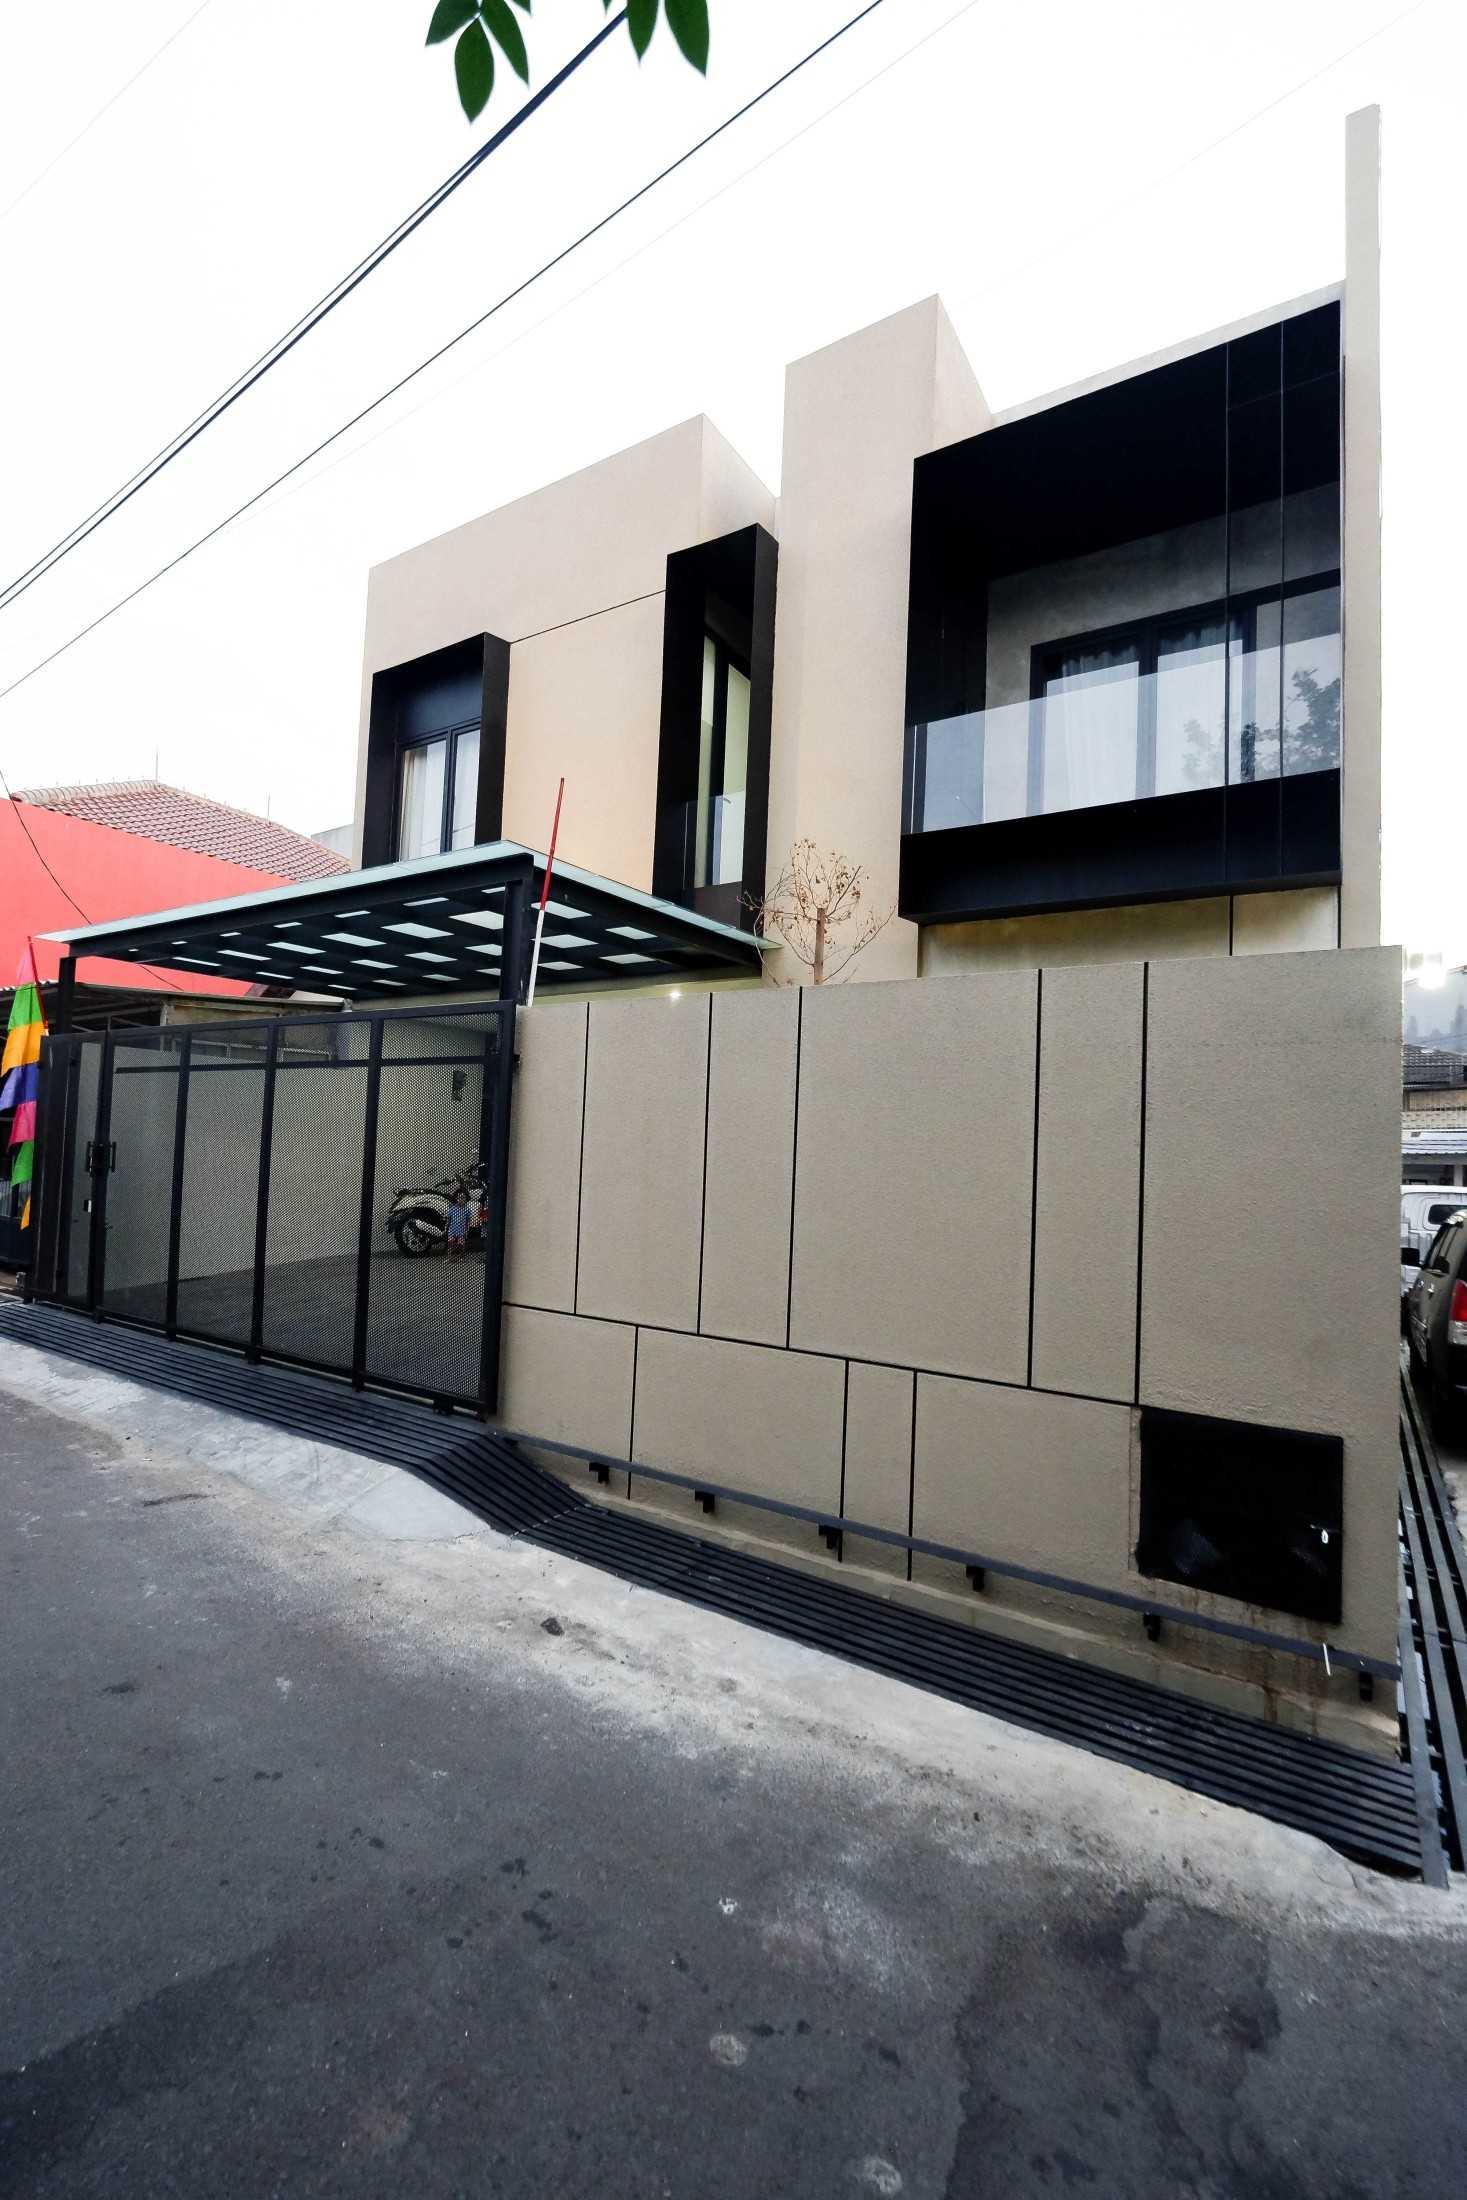 Natabumi Studio Melinjo House Jakarta, Daerah Khusus Ibukota Jakarta, Indonesia Jakarta, Daerah Khusus Ibukota Jakarta, Indonesia Natabumi-Studio-Melinjo-House  126354